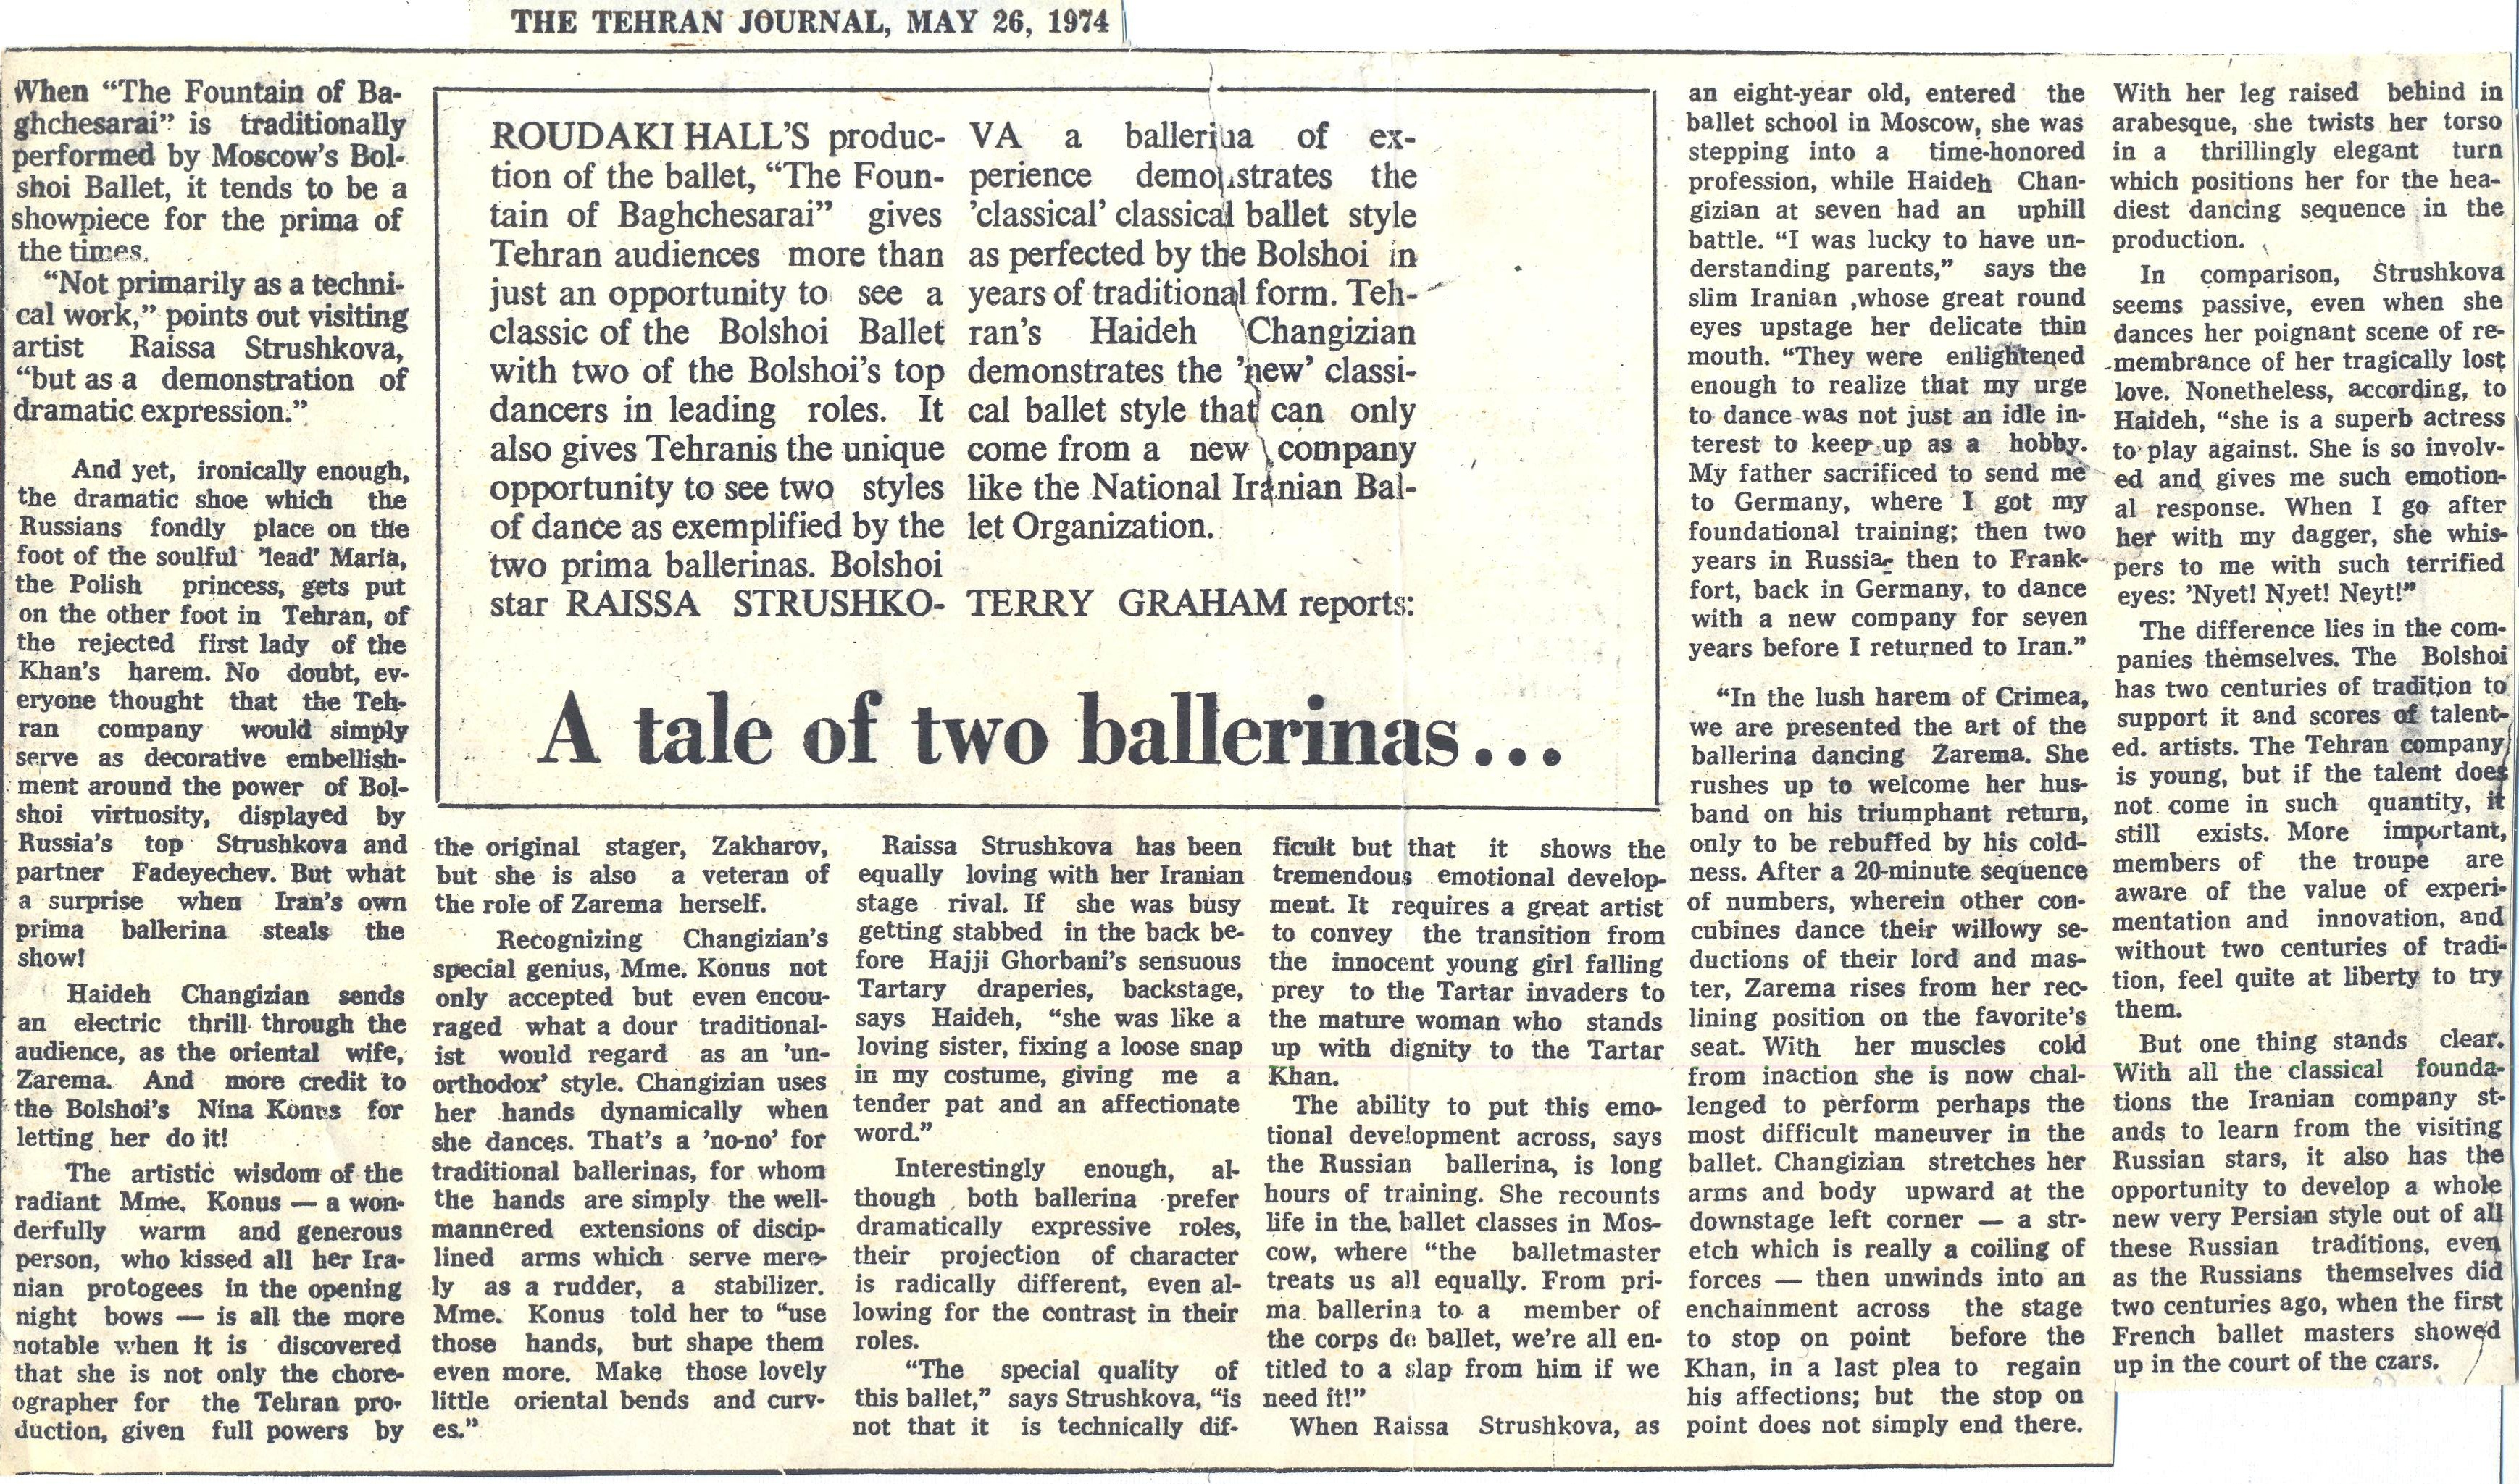 Tehran Journal, 1974